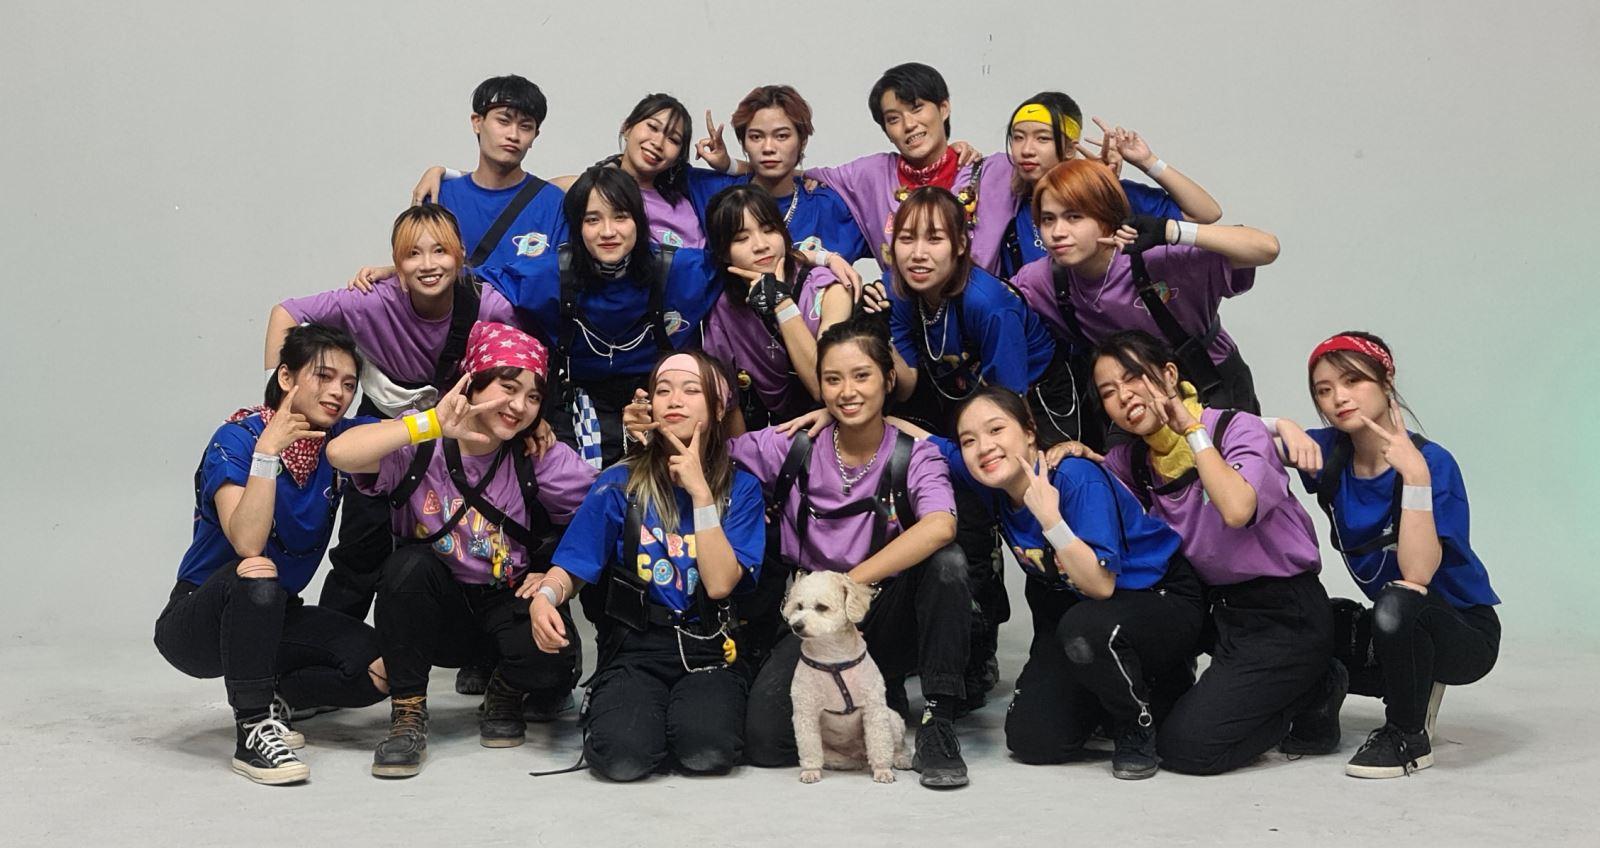 nhóm nhảy K-pop The Acode